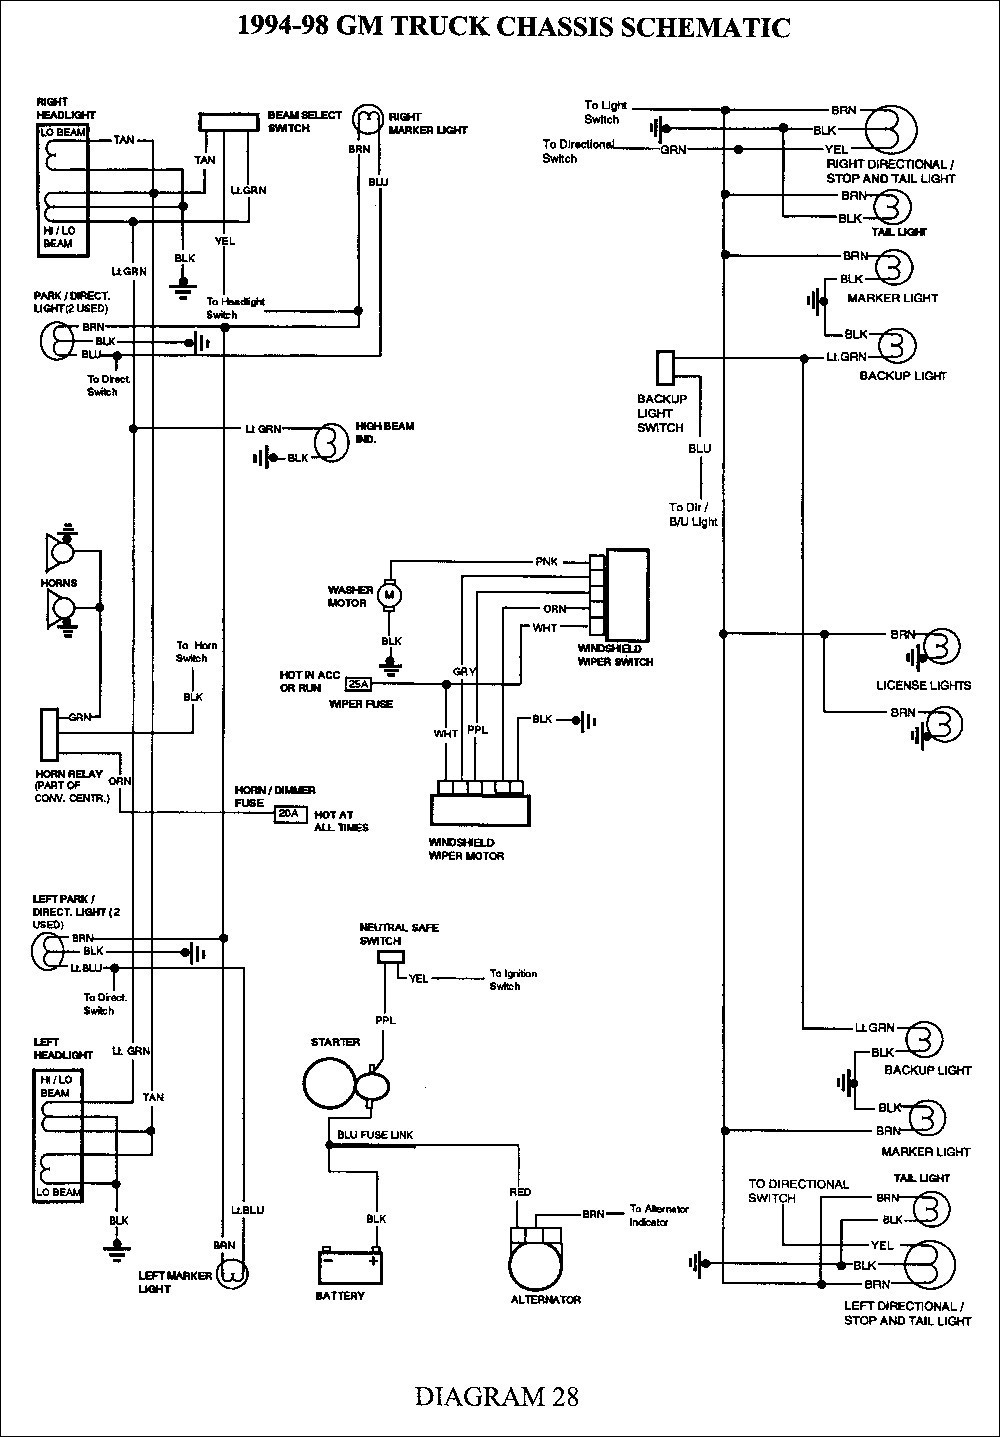 truck trailer wiring diagram inspirational wiring diagram image rh mainetreasurechest com trailer wiring diagram for 2002 chevy silverado trailer wiring diagram for 2004 chevy silverado